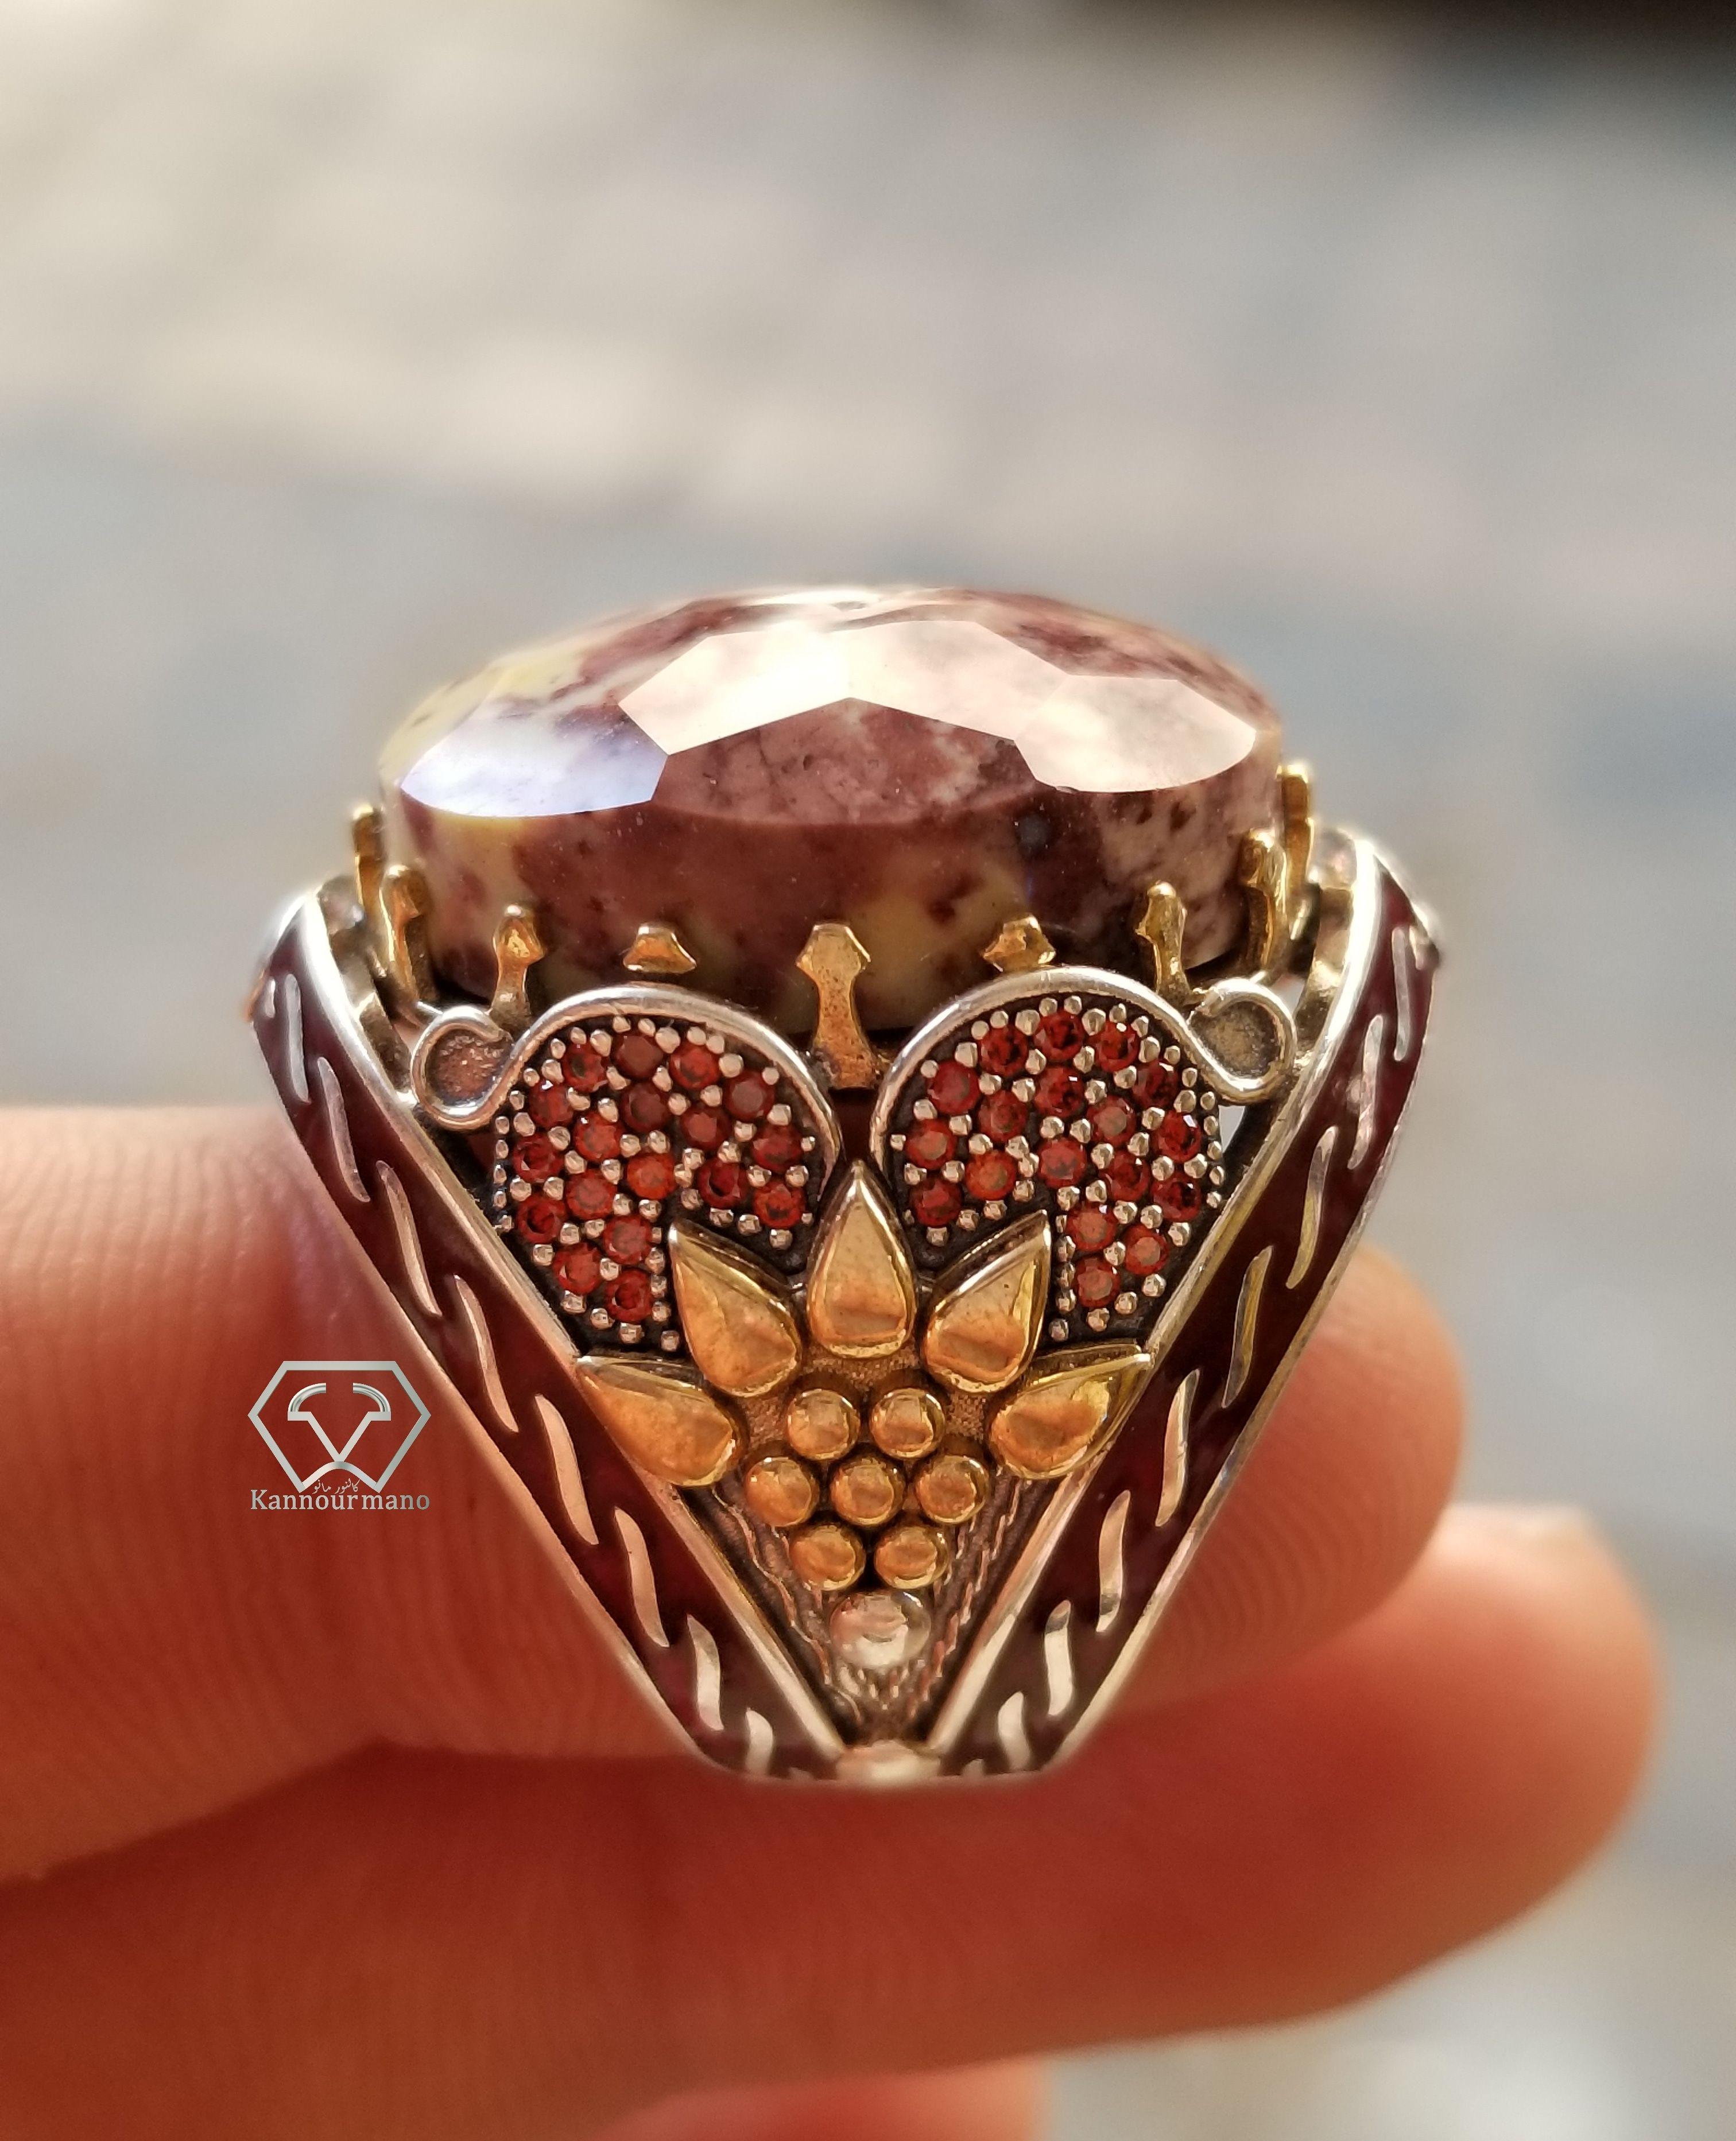 Pin By Kannourmano On Rings Yemeni Agate Mens Silver Rings Silver Man Silver Rings